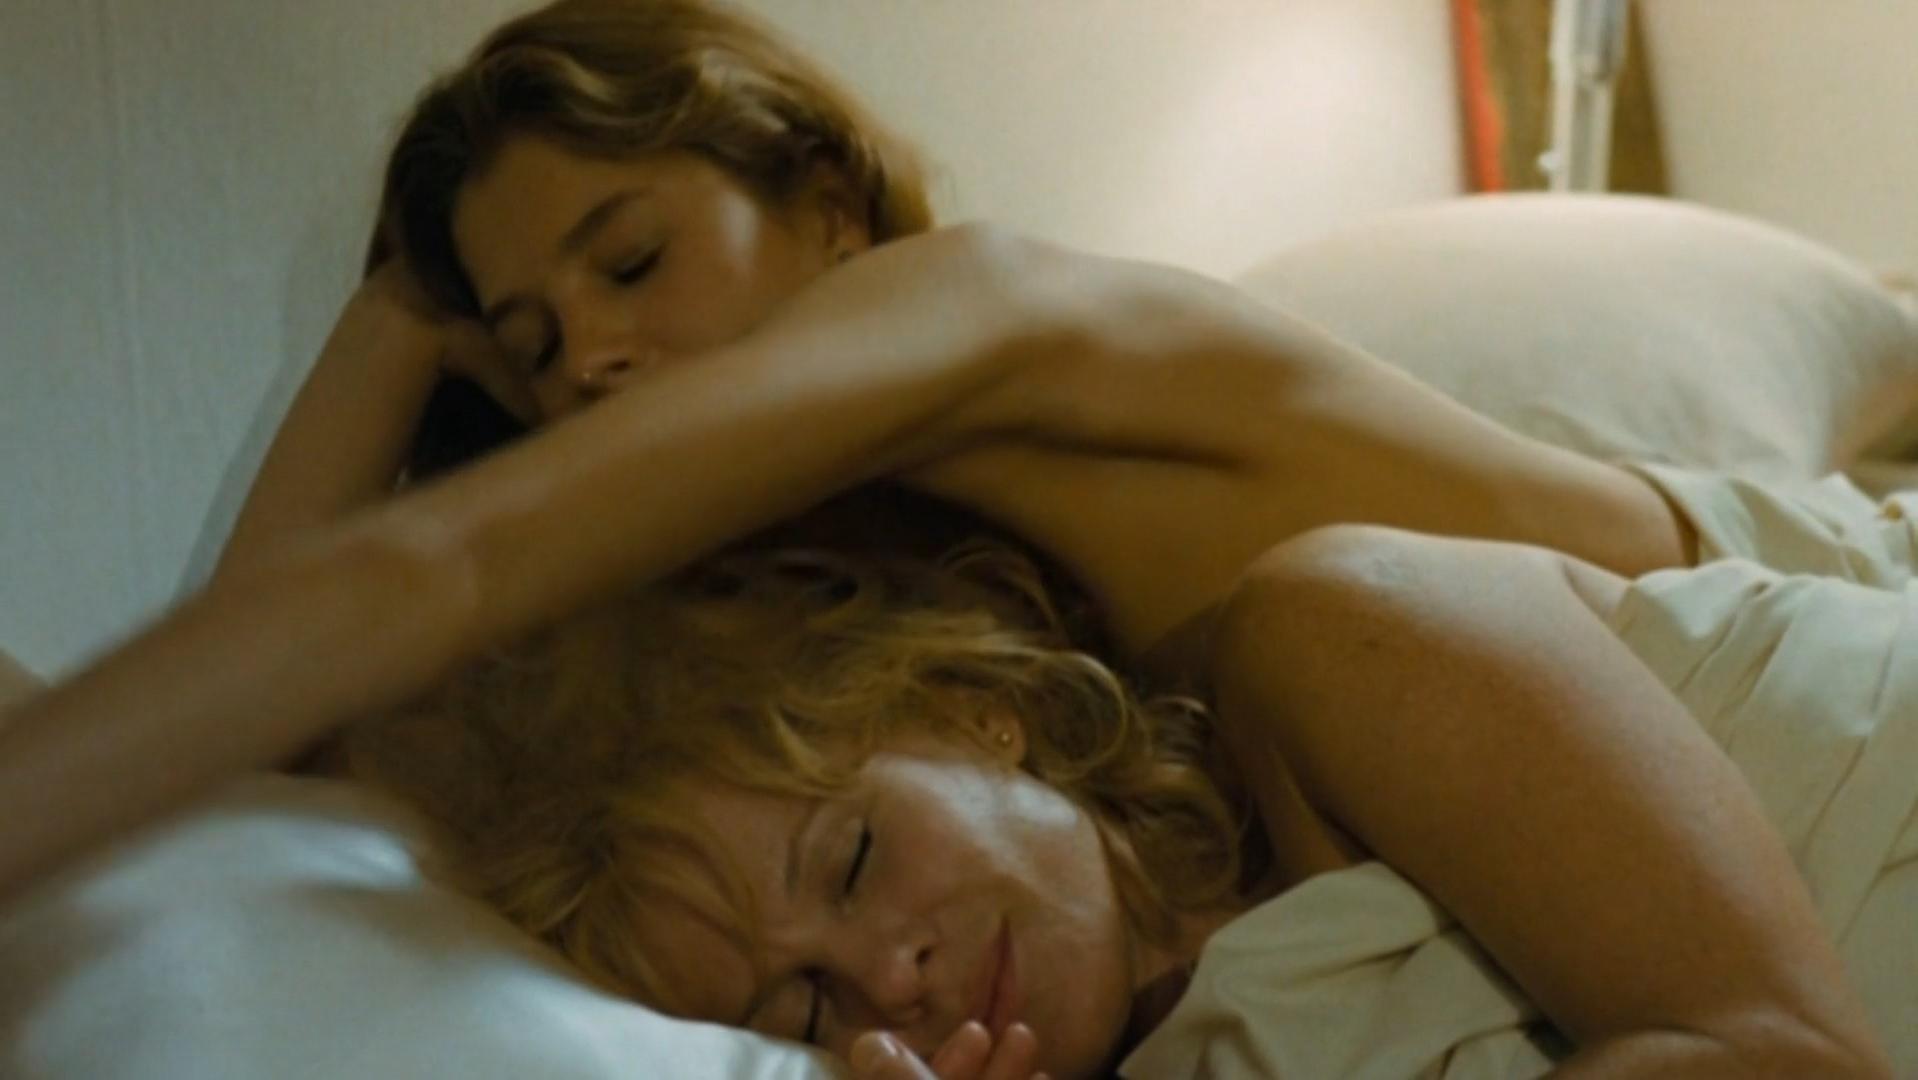 Bibi Andersson nude, Sandra Dumas nude - Twee vrouwen (1979)